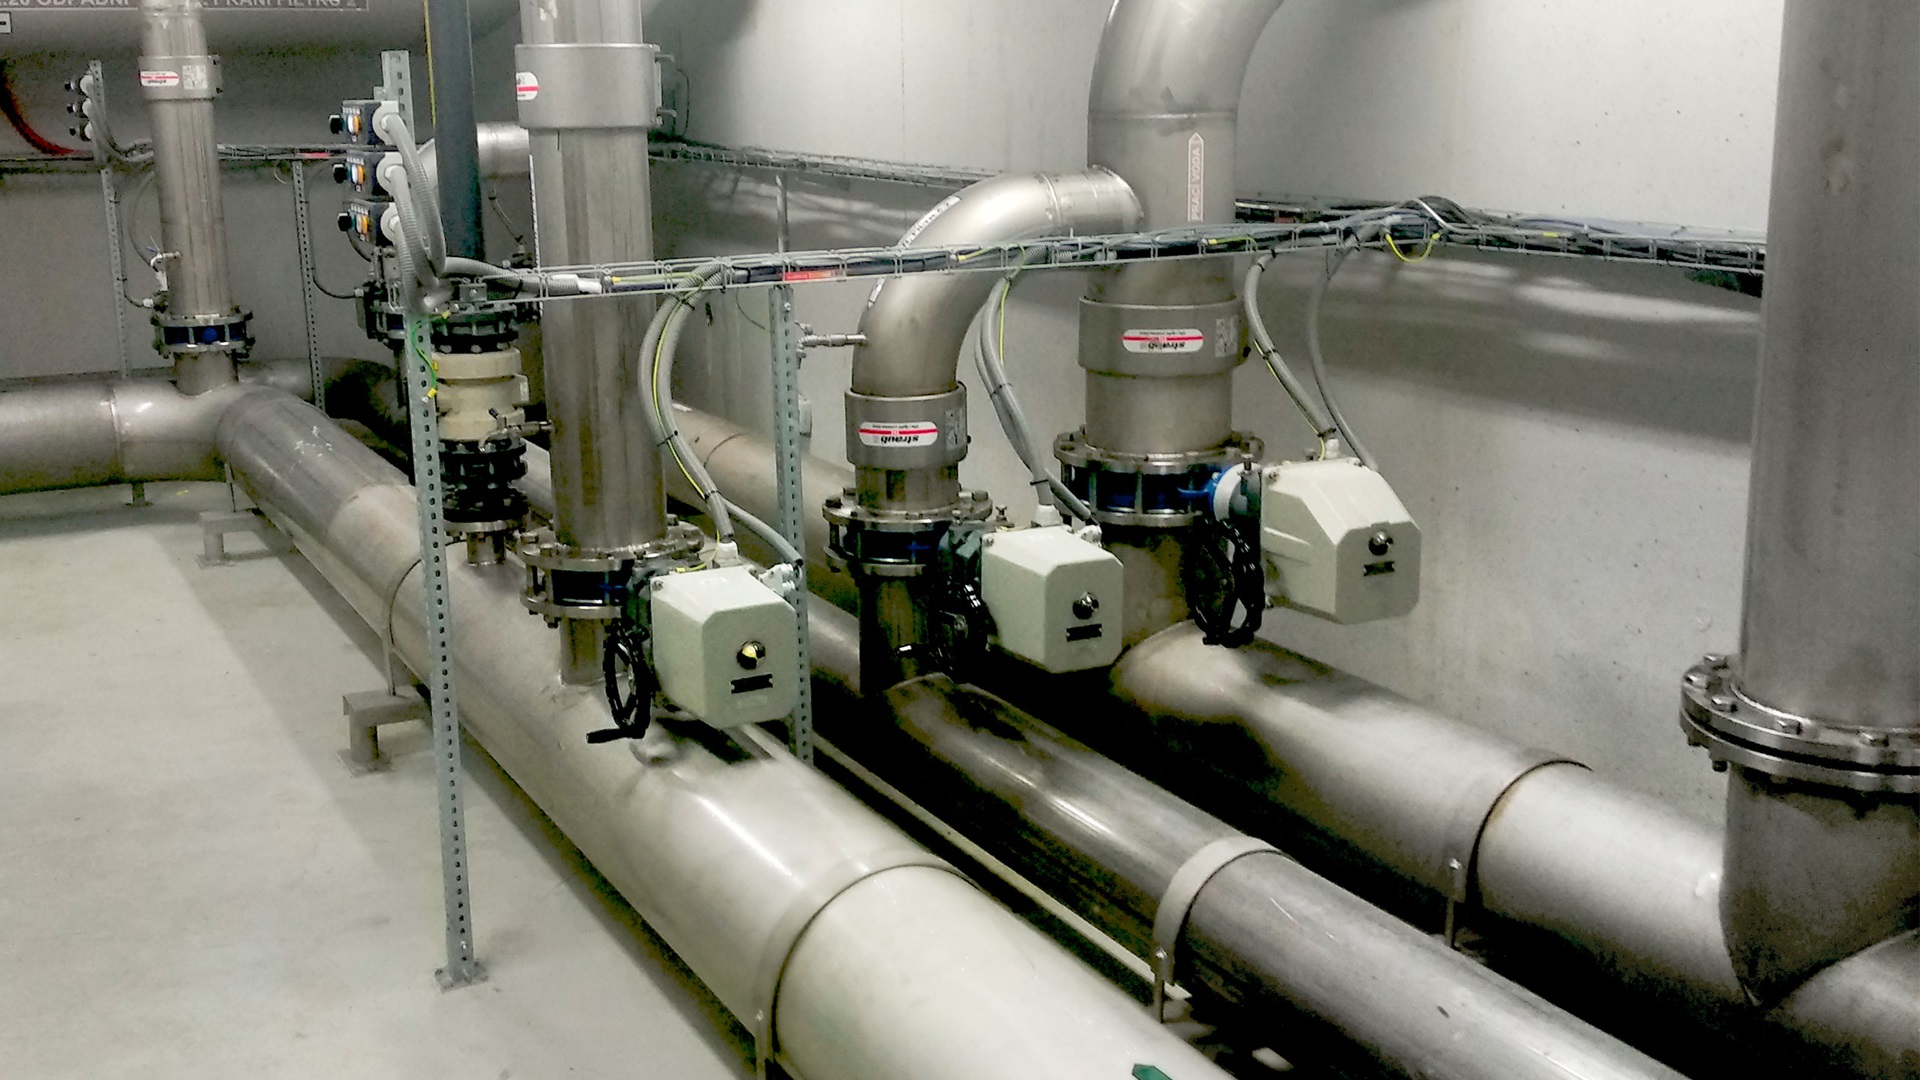 Písek has got its own water treatment plant and AVK VODKA install valves